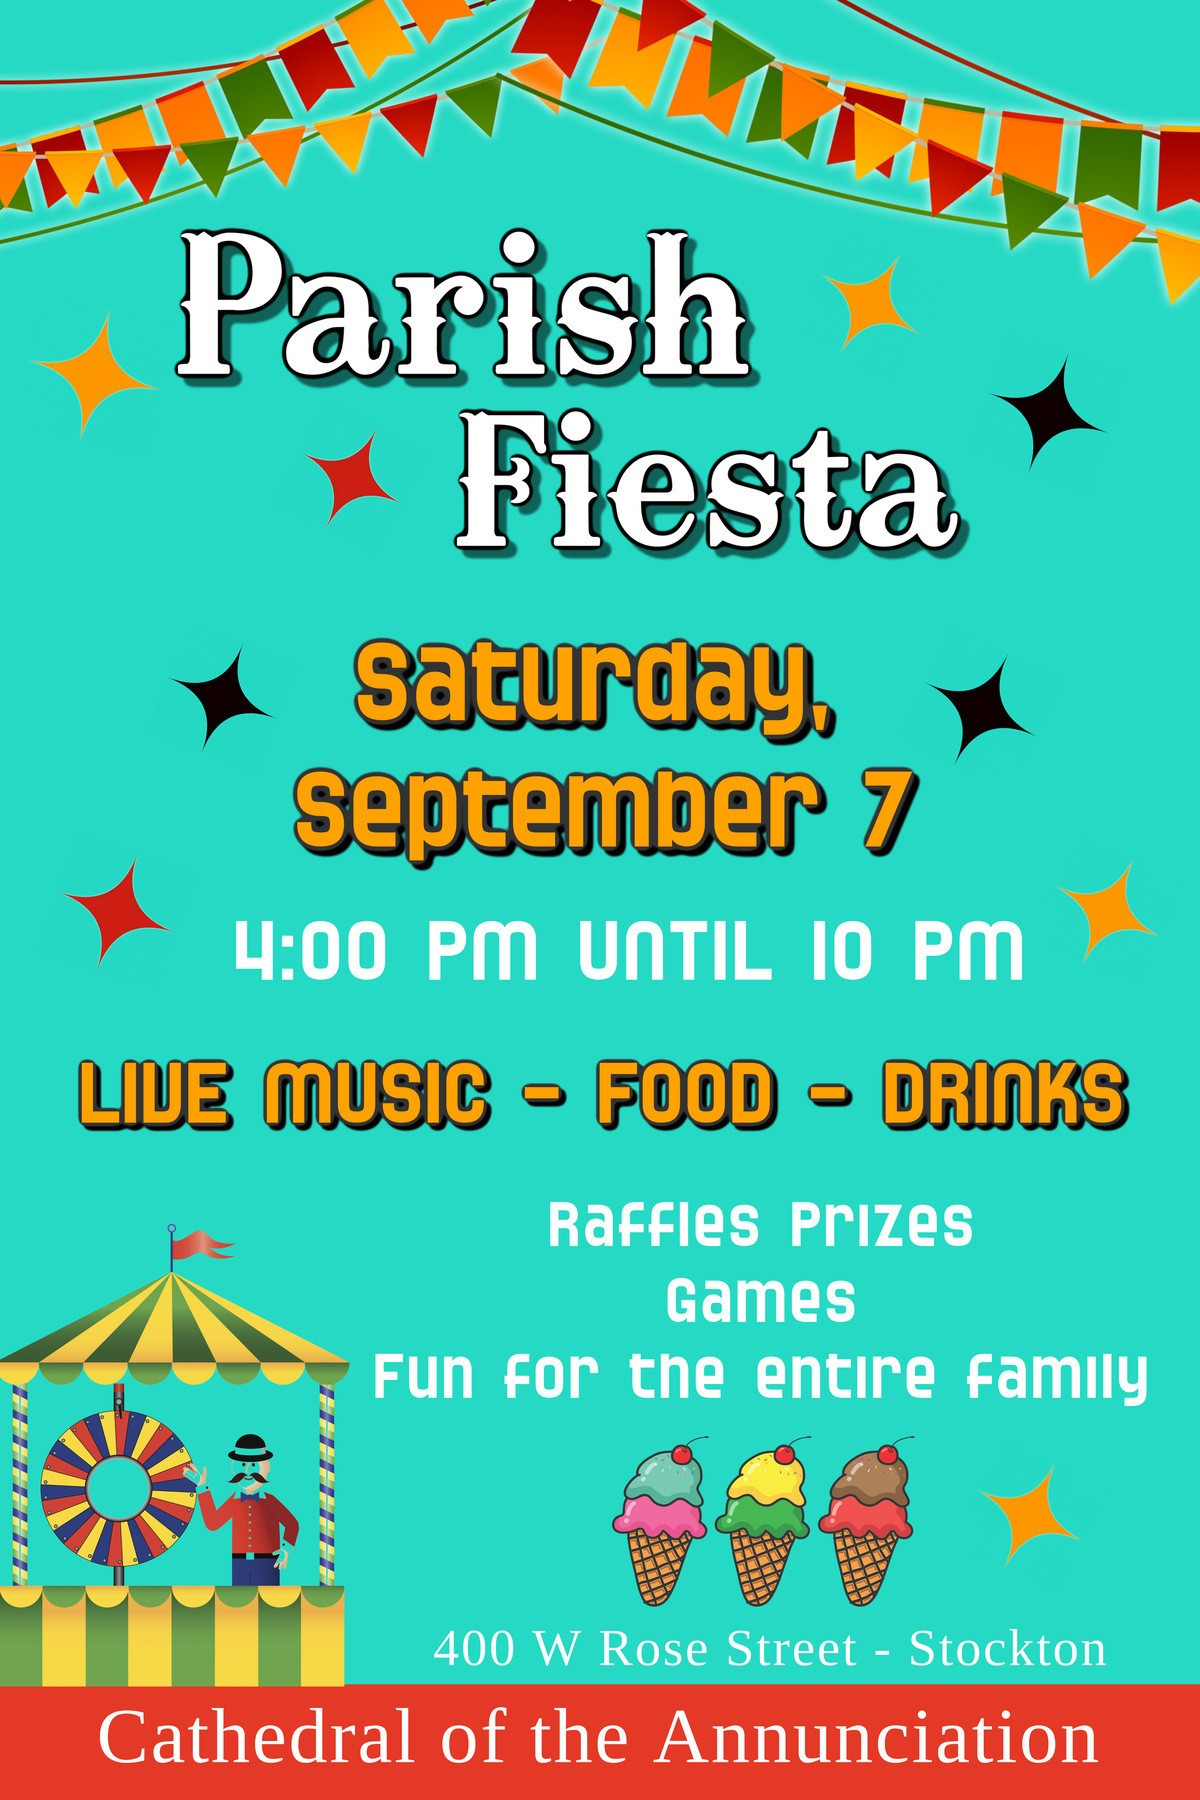 Parish Fiesta